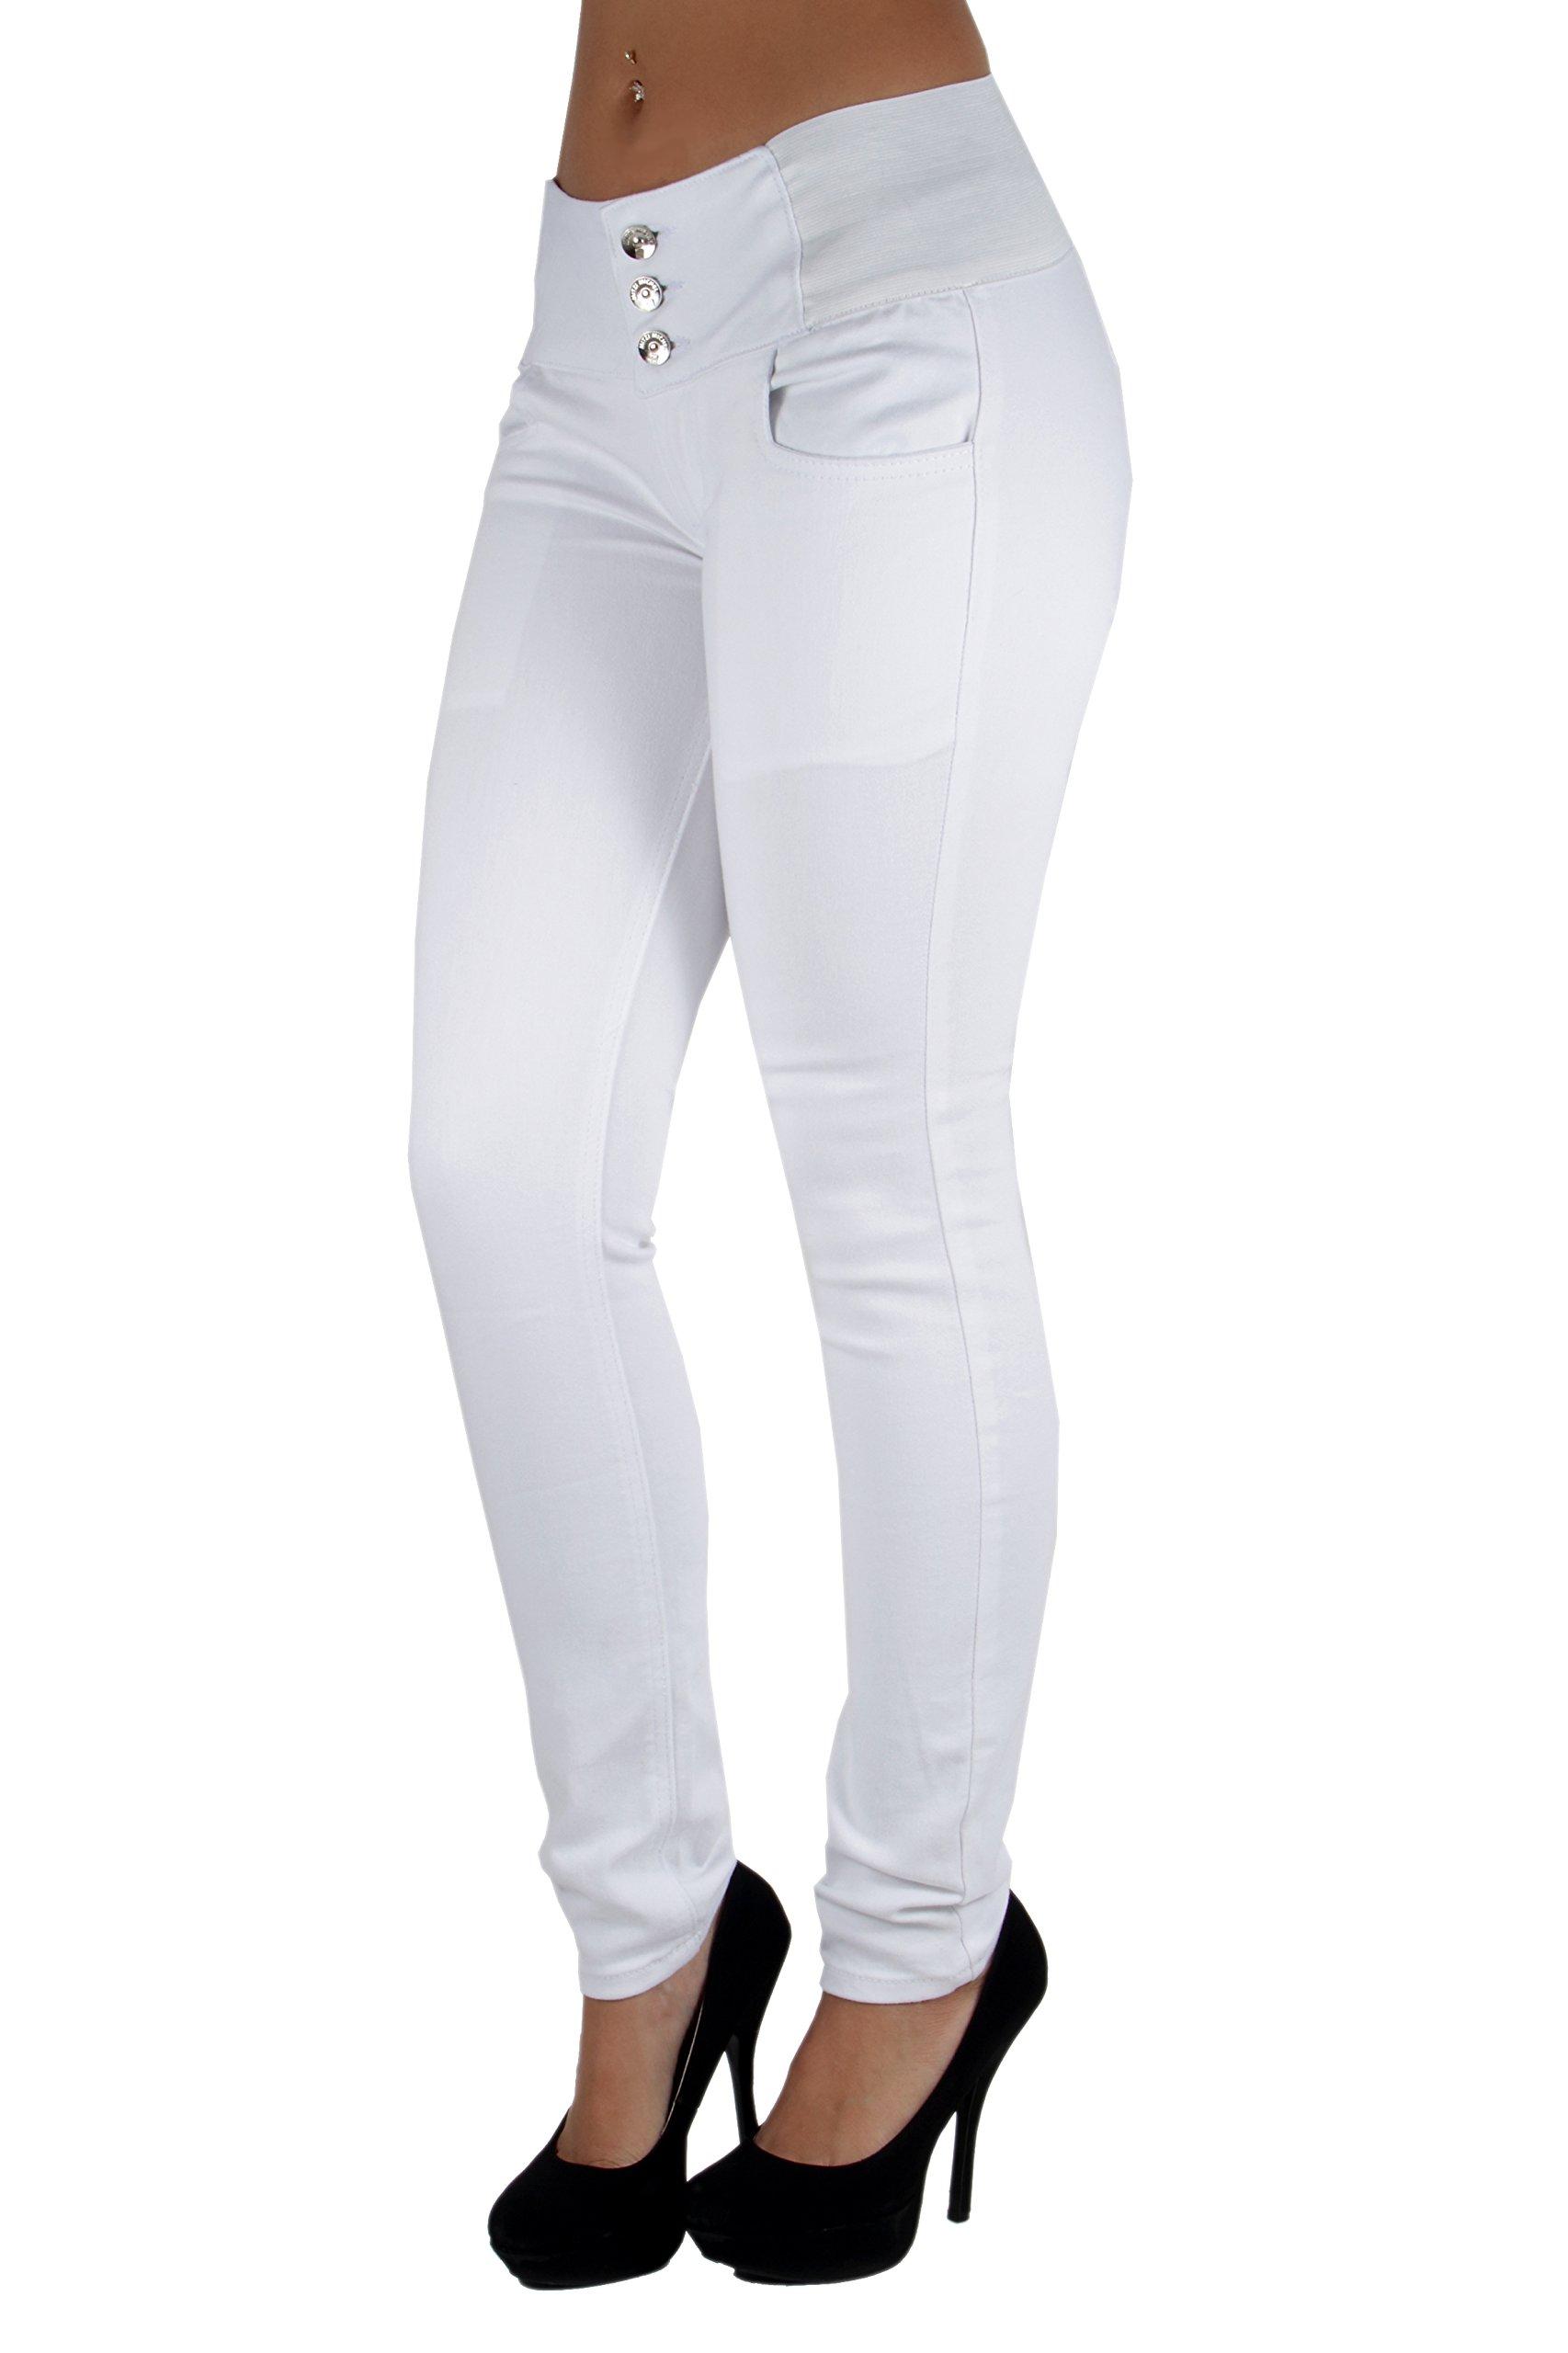 Fashion2Love WG0029 - Colombian Design, Levanta Cola, Elastic Mid Waist Skinny Jeans in White Size 9